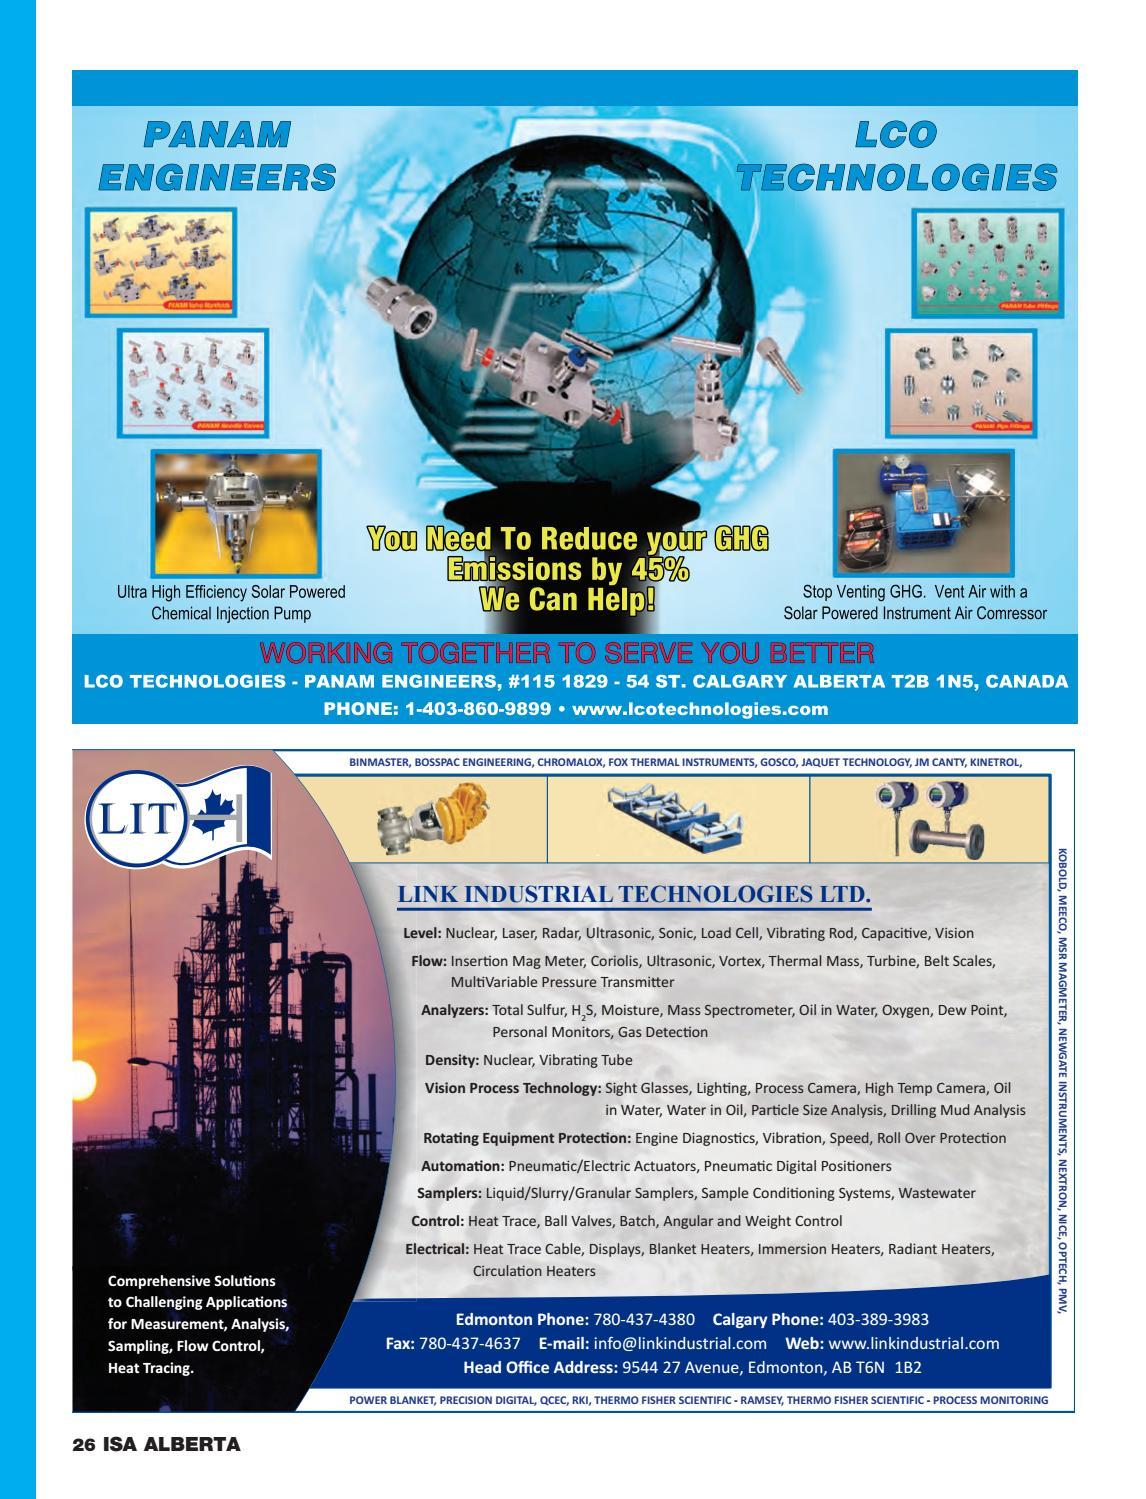 ISA Alberta Directory 23edition2016 by ISA Alberta Directory